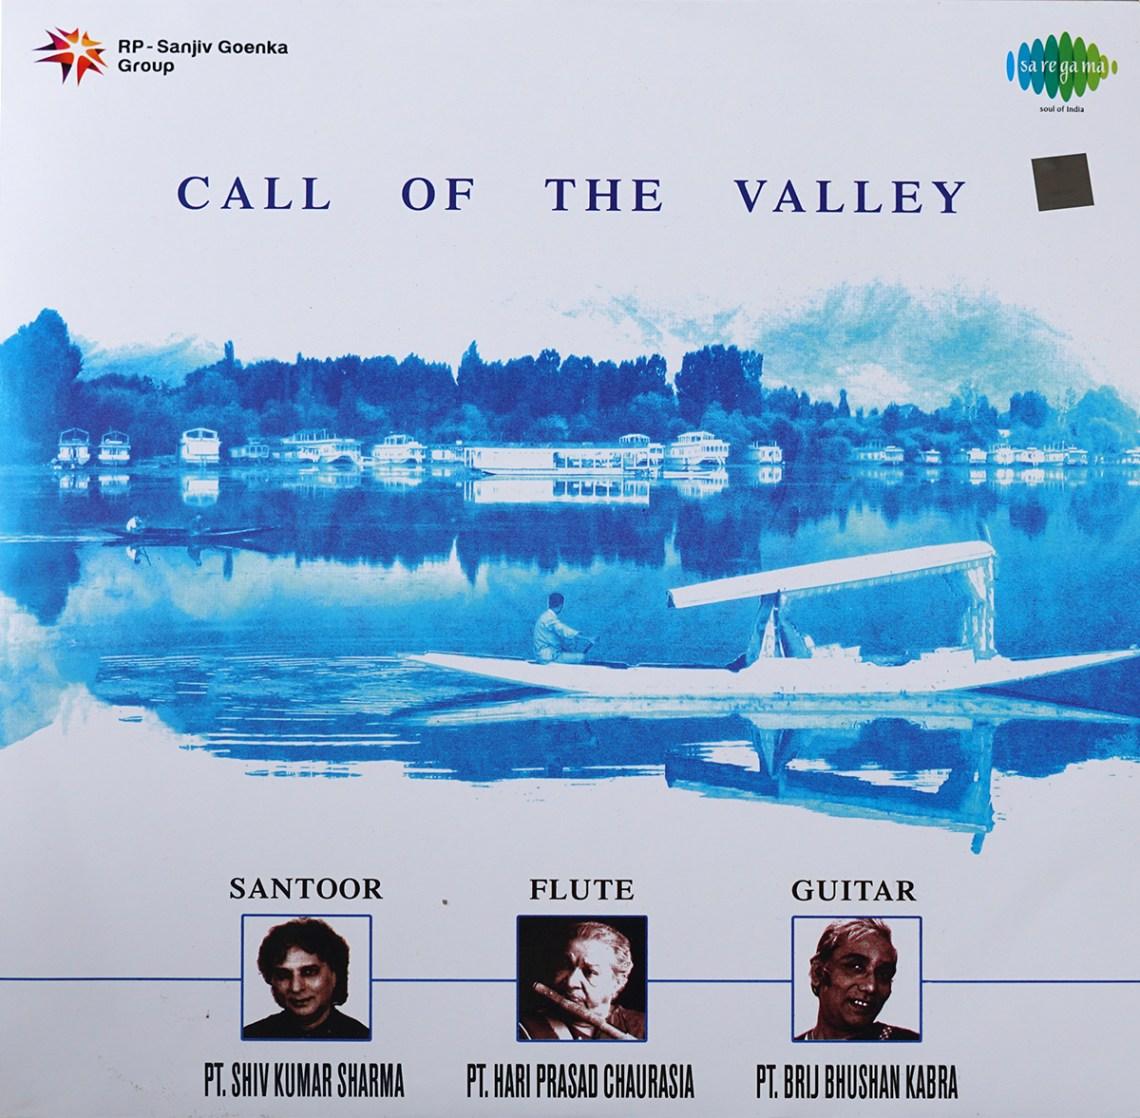 Call of the Valley is a popular music album with music of Kashmir featuring santoor maestro Shivkumar Sharma, flute maestro Hariprasad Chaurasia and guitar maestro Brij Bhushan Kabra